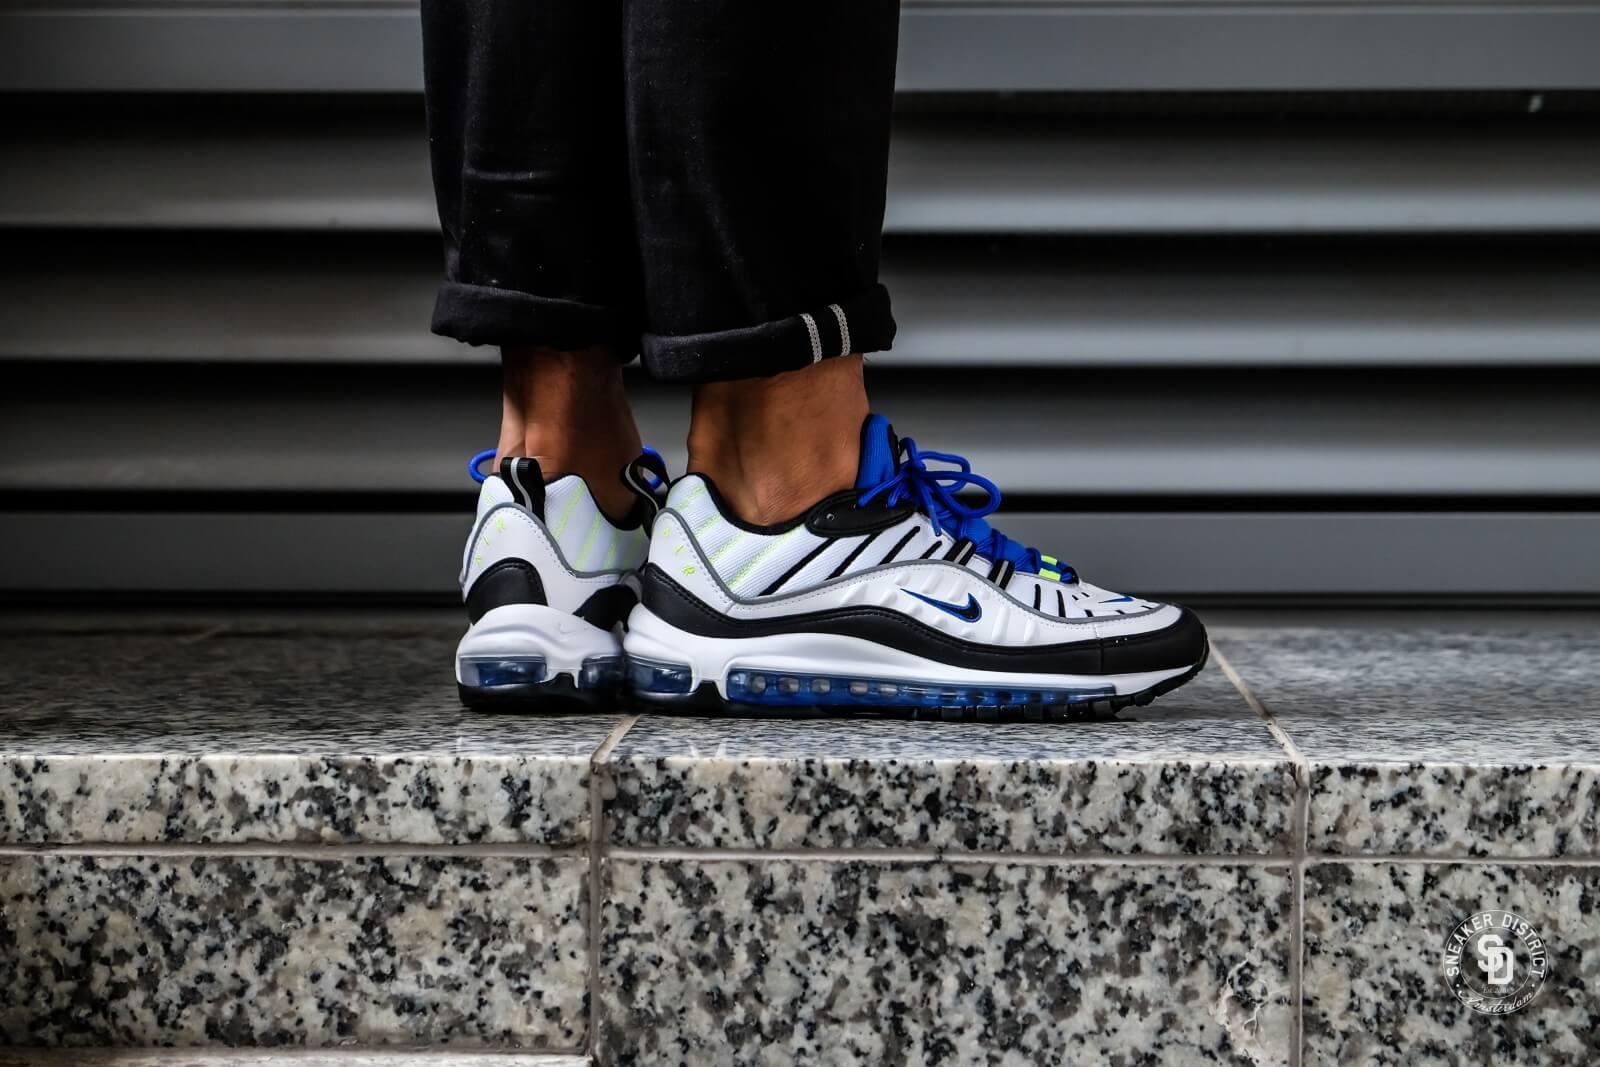 Nike Air Max 98 White/Black-Racer Blue